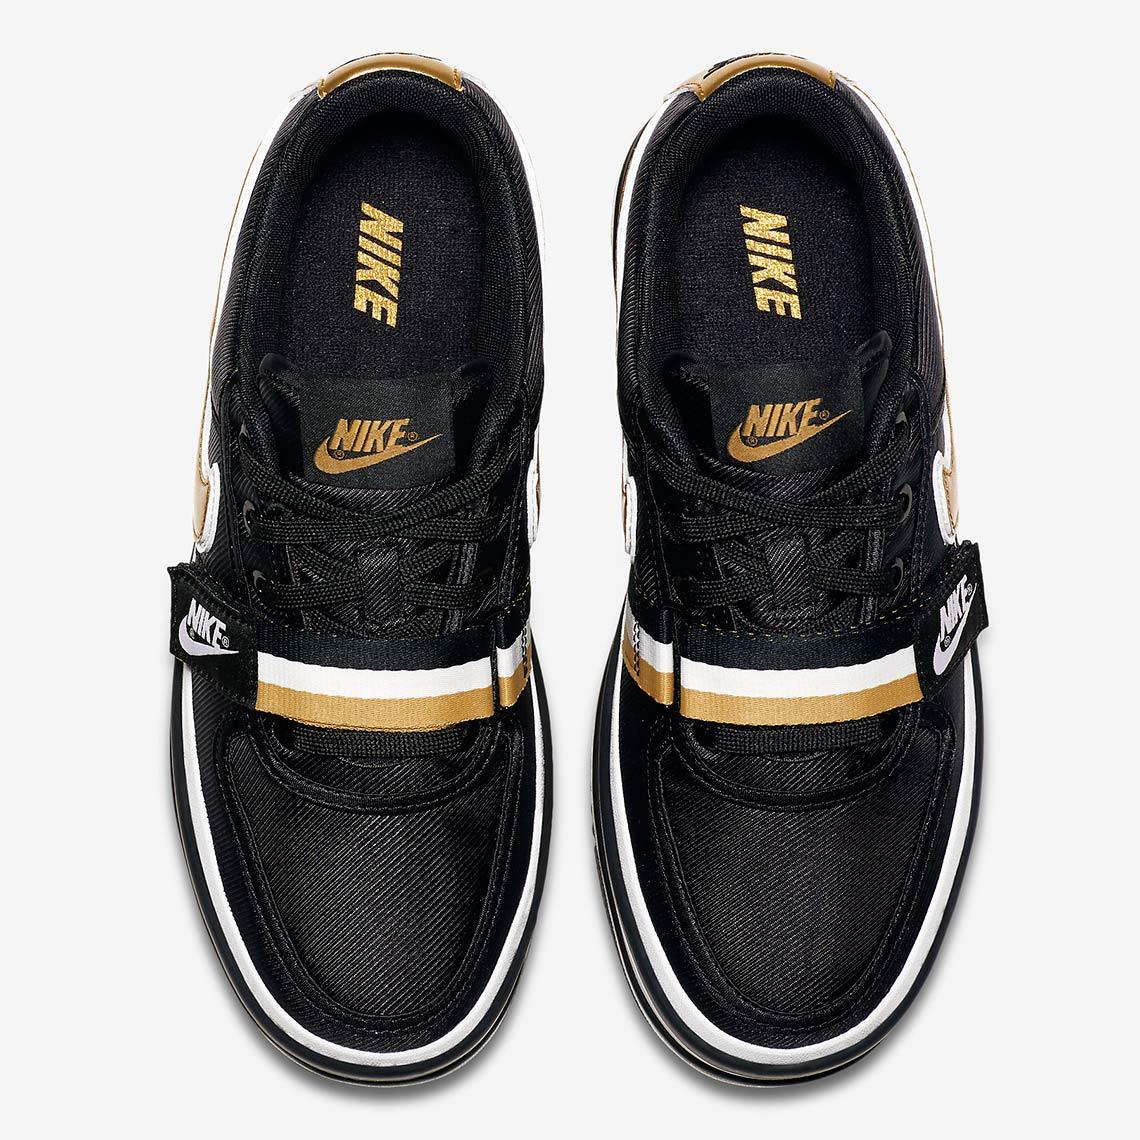 6cfa7452885 Nike Vandal Surprise Release Info AO2868-001 AO2868-002 ...